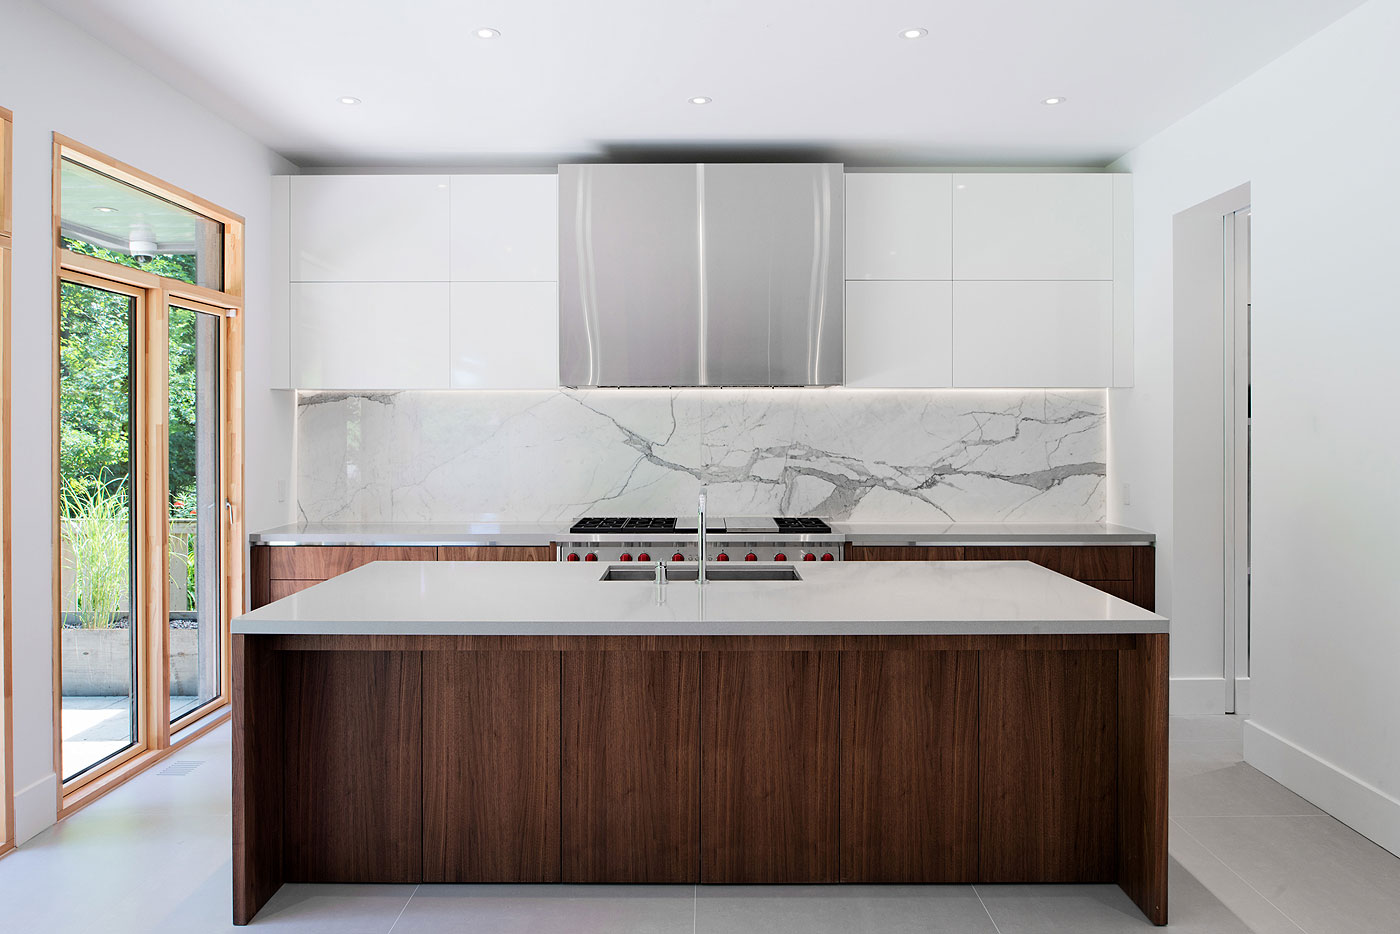 residencia-heathdale-tact-architecture-design (2)